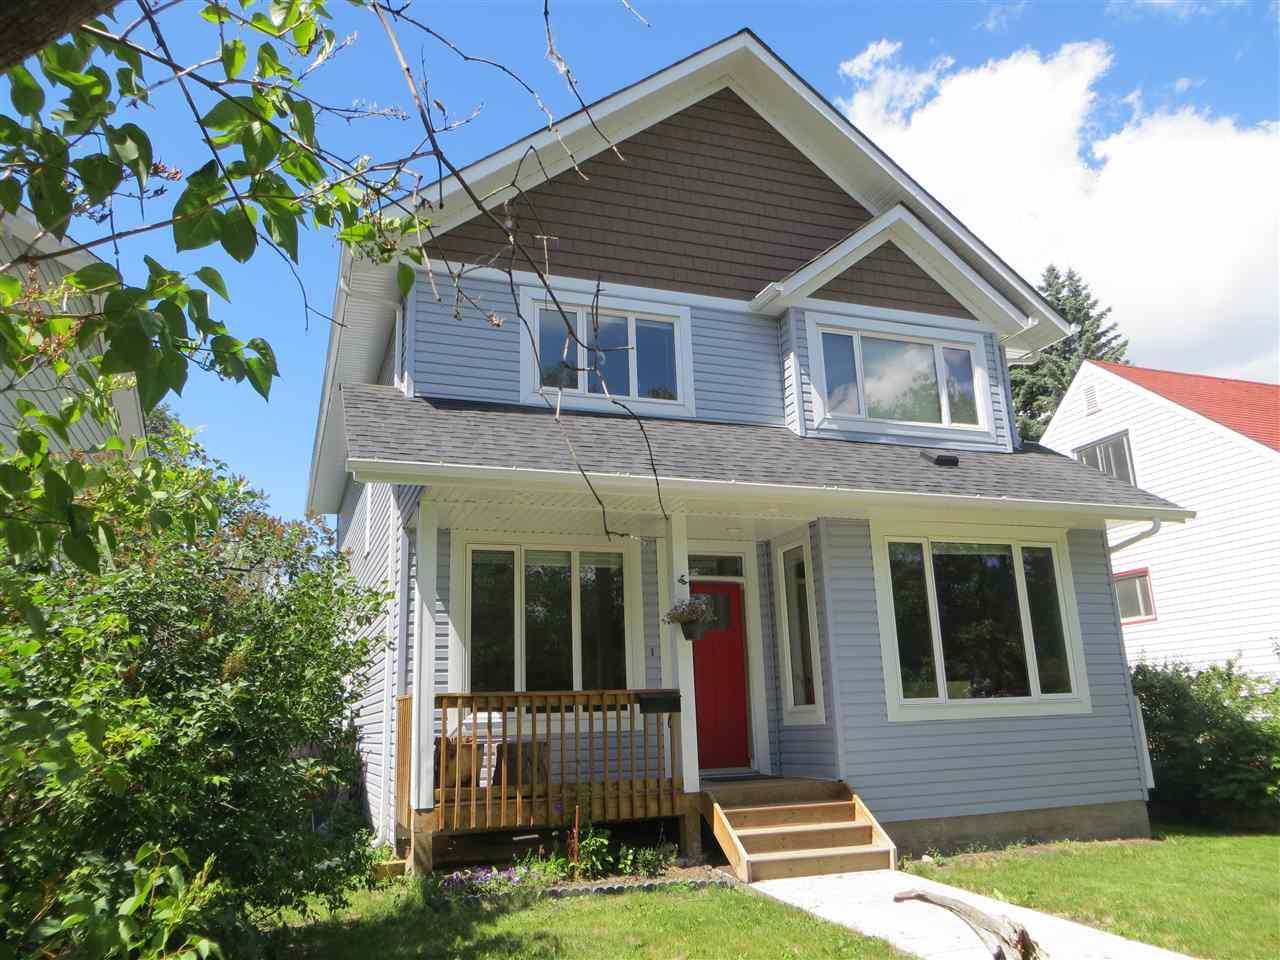 10460 145 Street, 3 bed, 3 bath, at $675,000